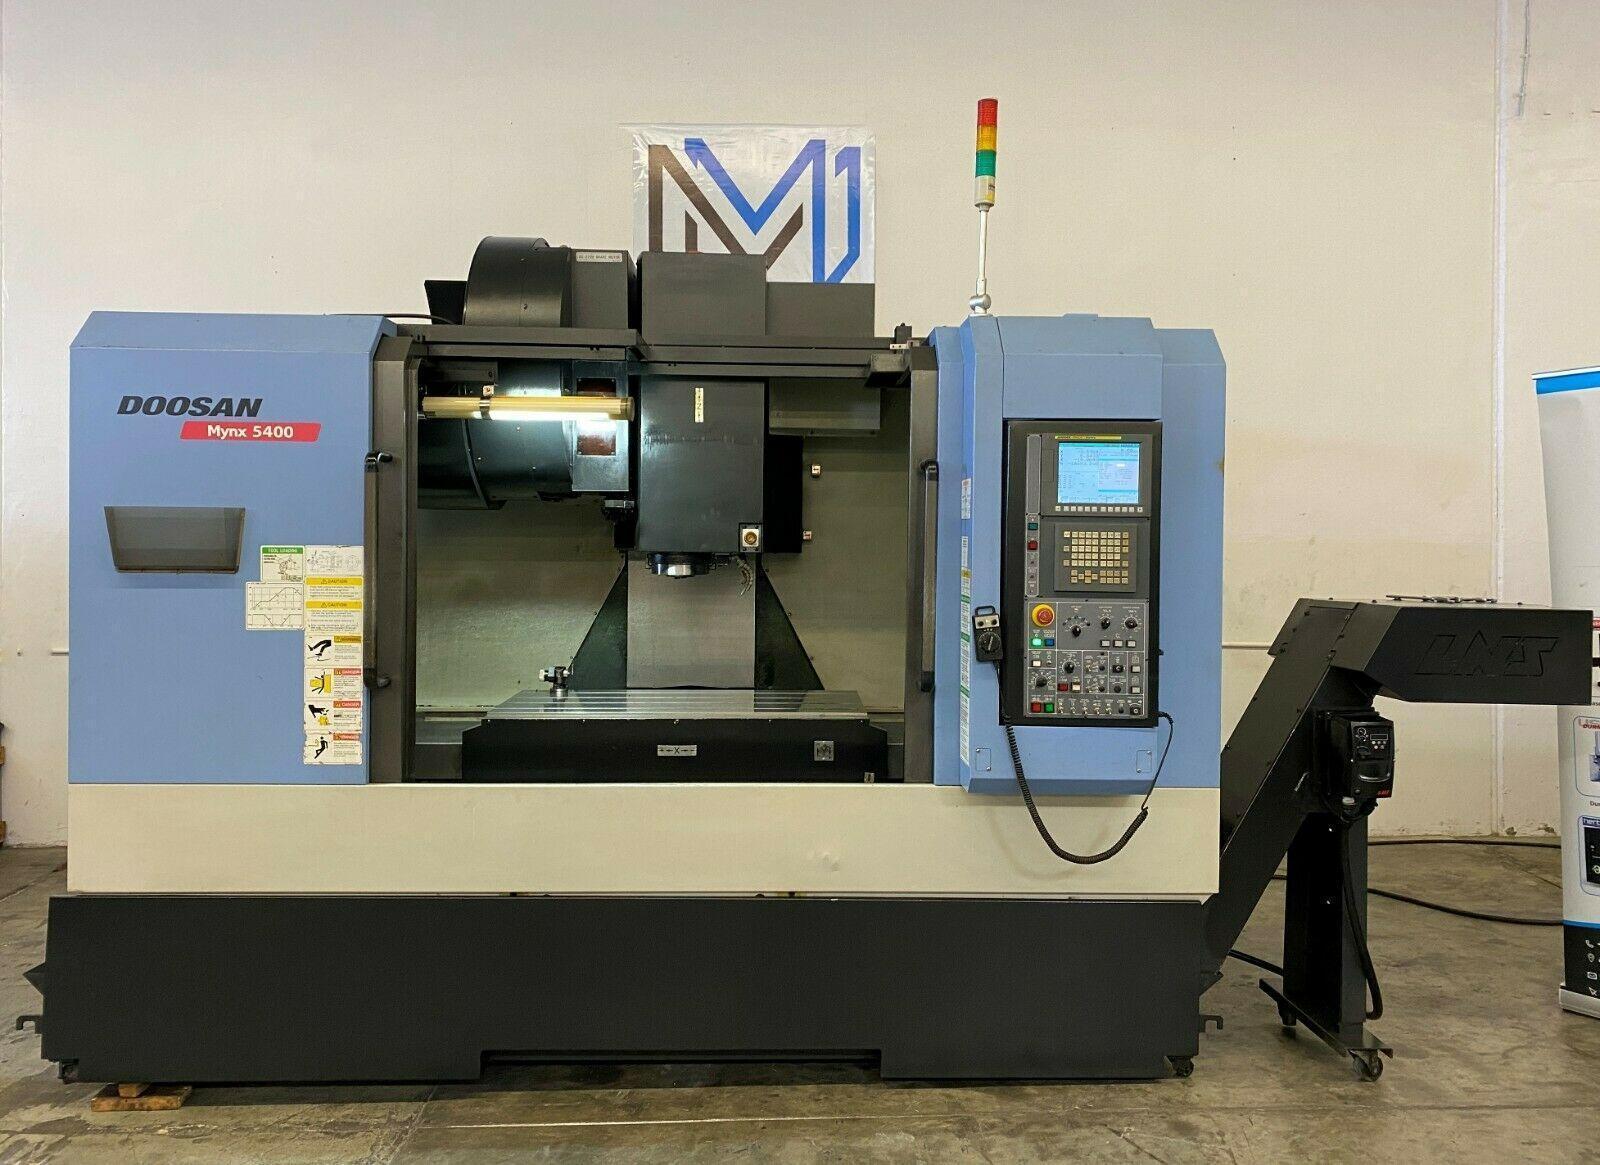 DOOSAN MYNX 5400 VERTICAL MACHINING CENTER